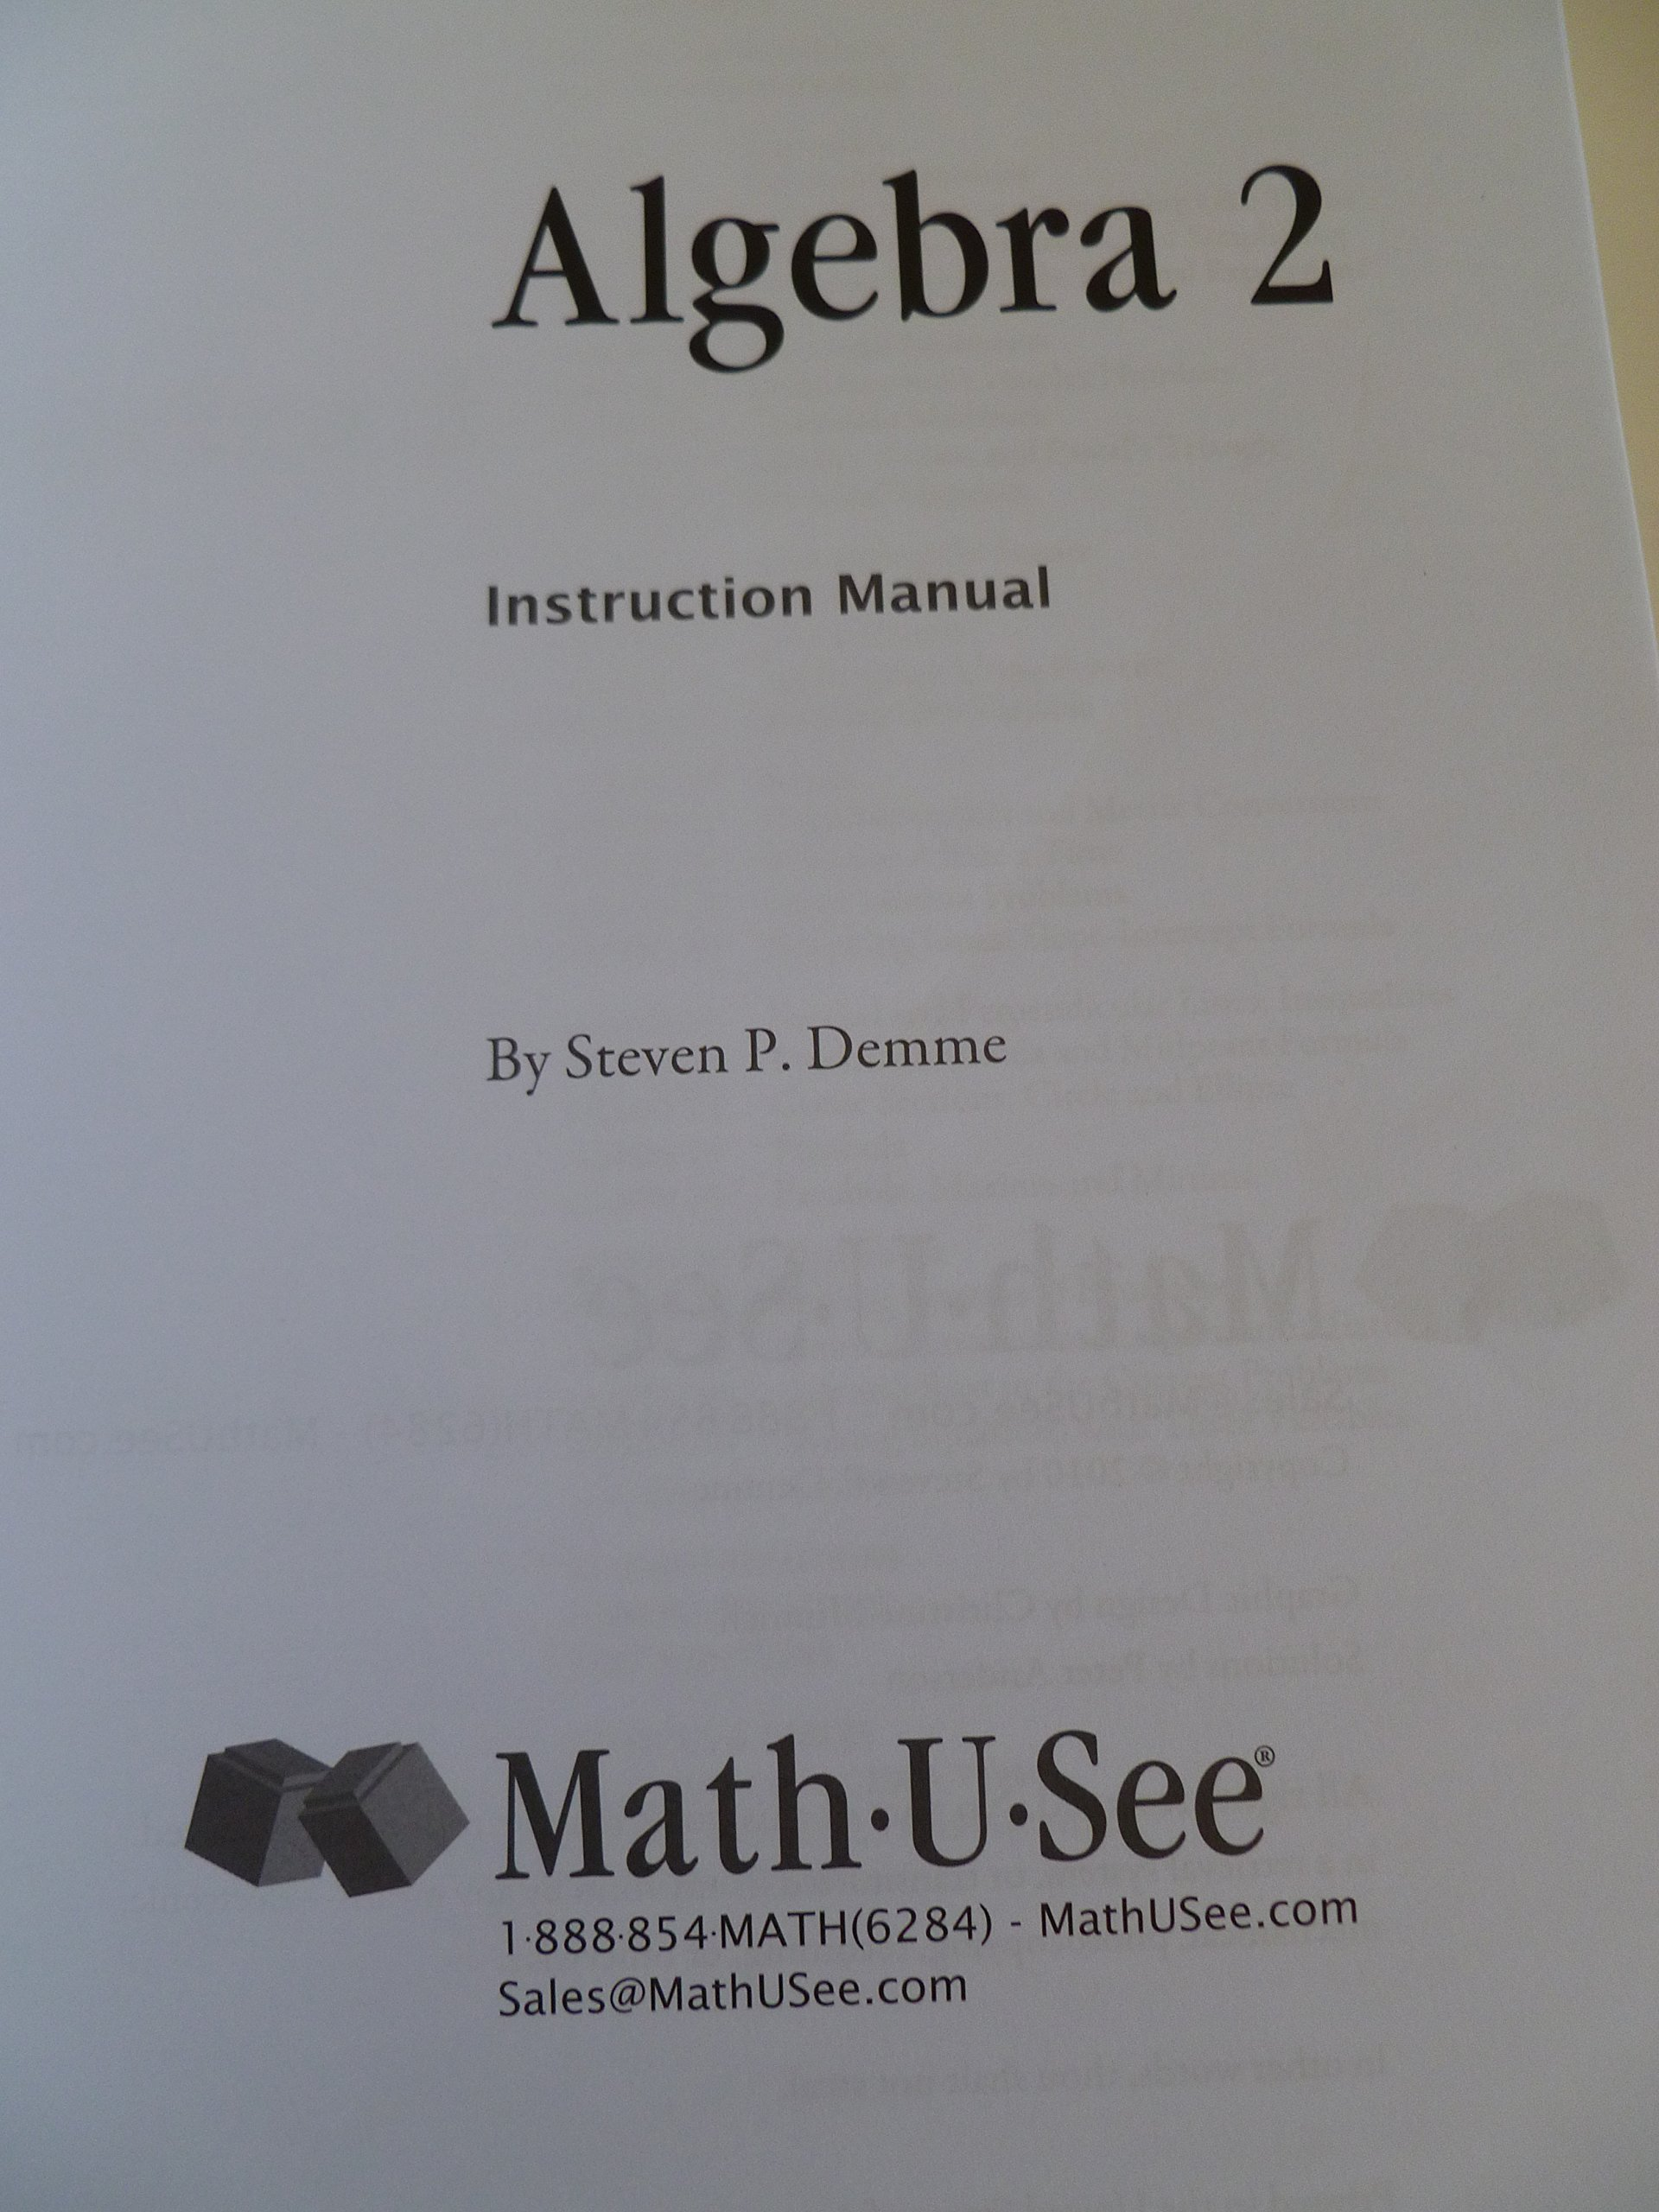 Contemporary Math U See Drill Photo - General Worksheet ...